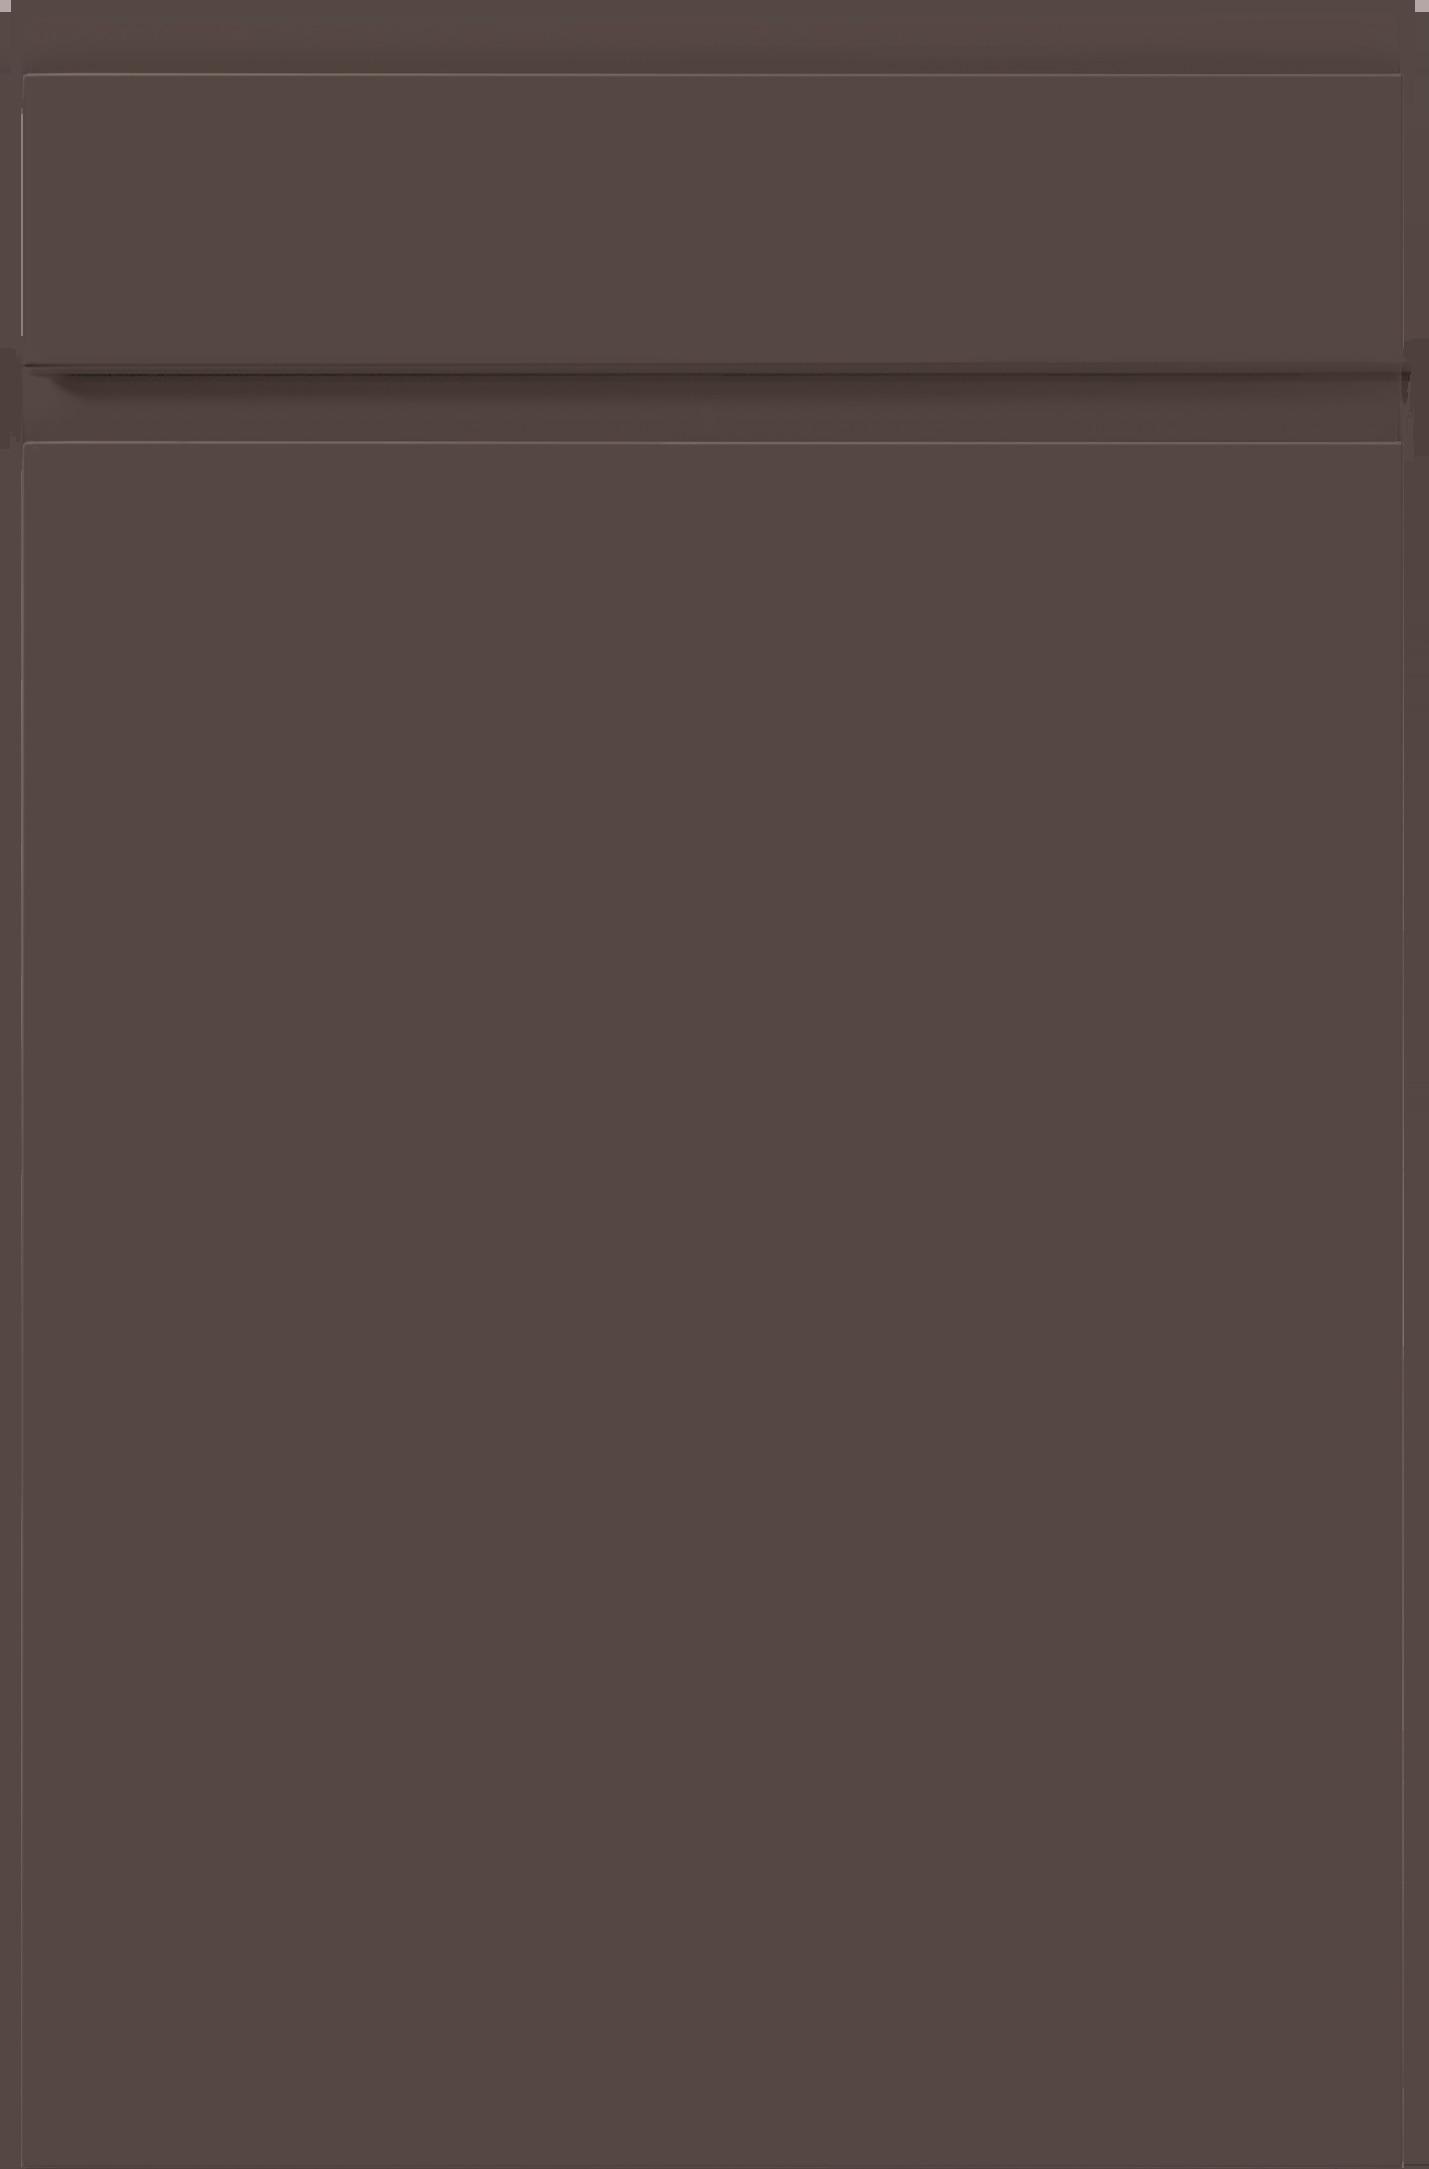 Façade OSLO-MAT Brun havane mat soyeux